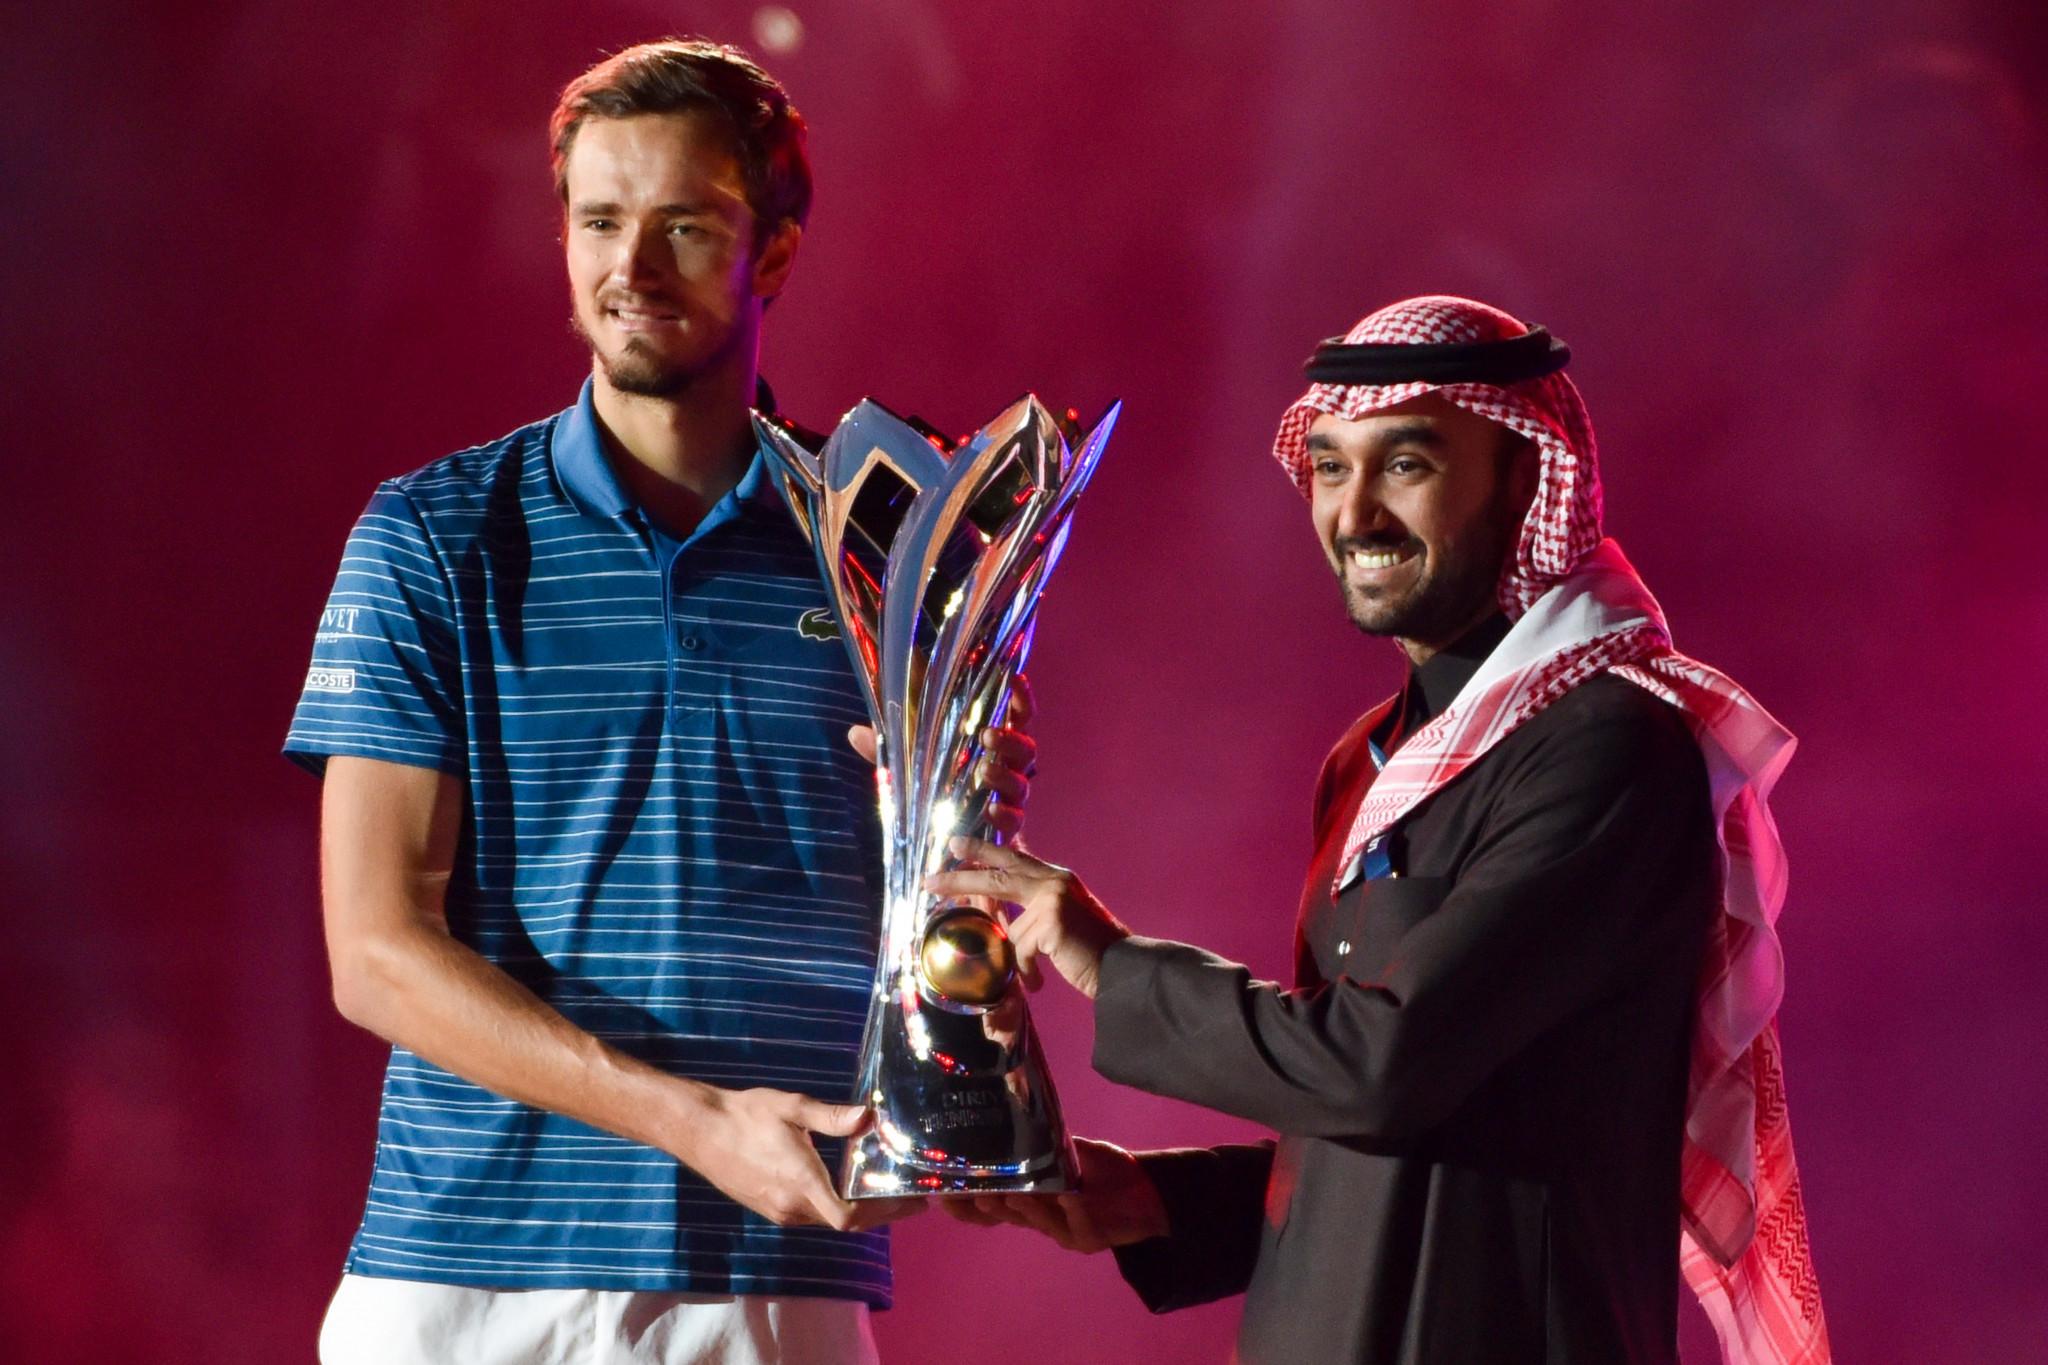 Russia's Daniil Medvedev won the inaugural Diriyah Tennis Cup ©Getty Images